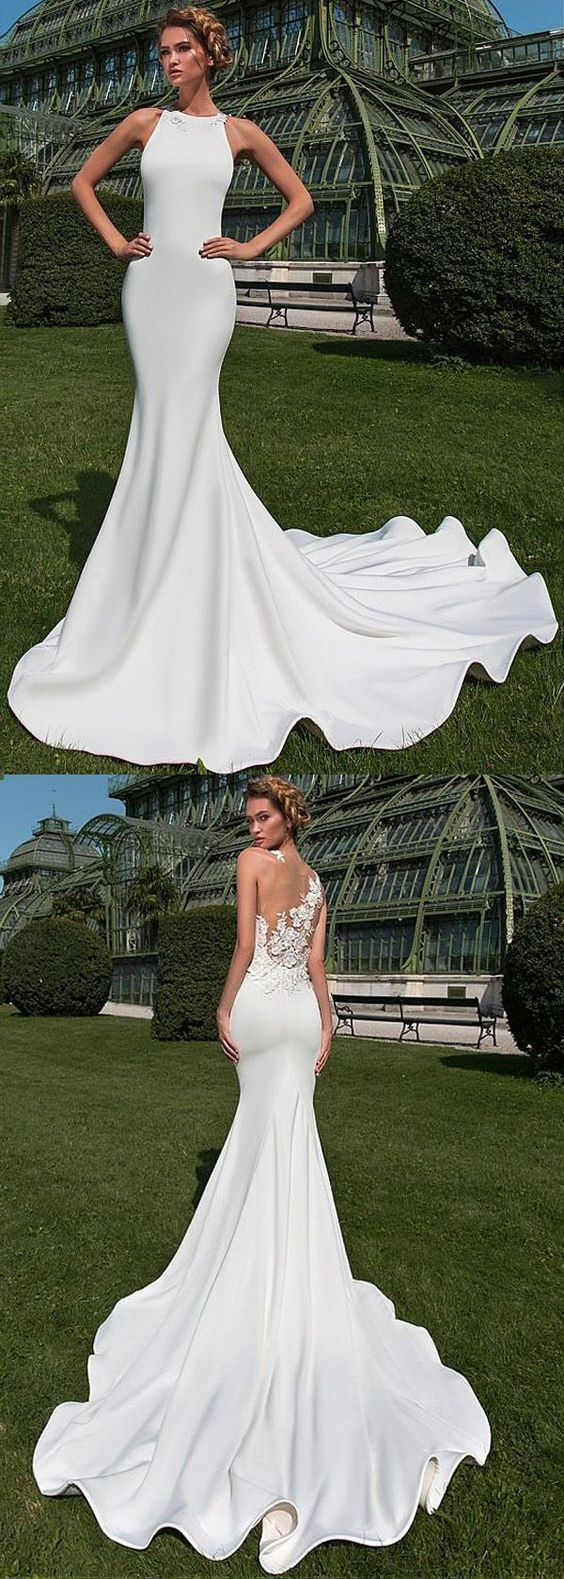 Fabulous Satin Jewel Neckline Mermaid Wedding Dress With Lace Appliques & 3D